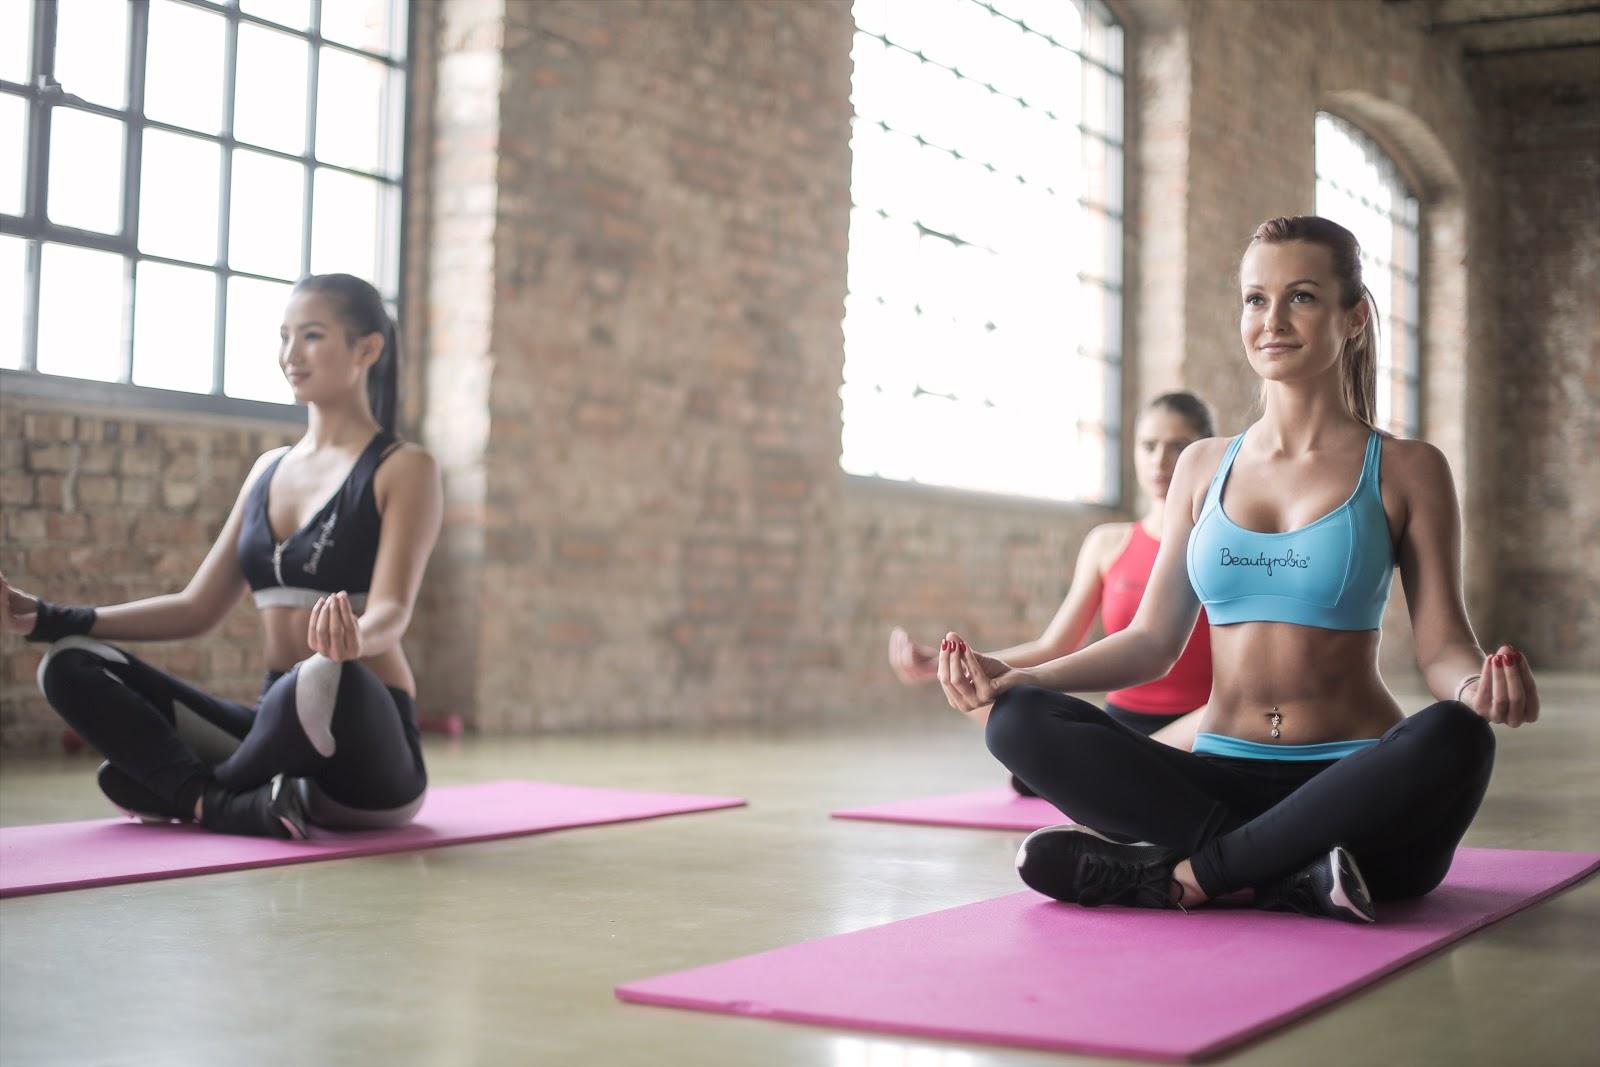 three women in a yoga studio